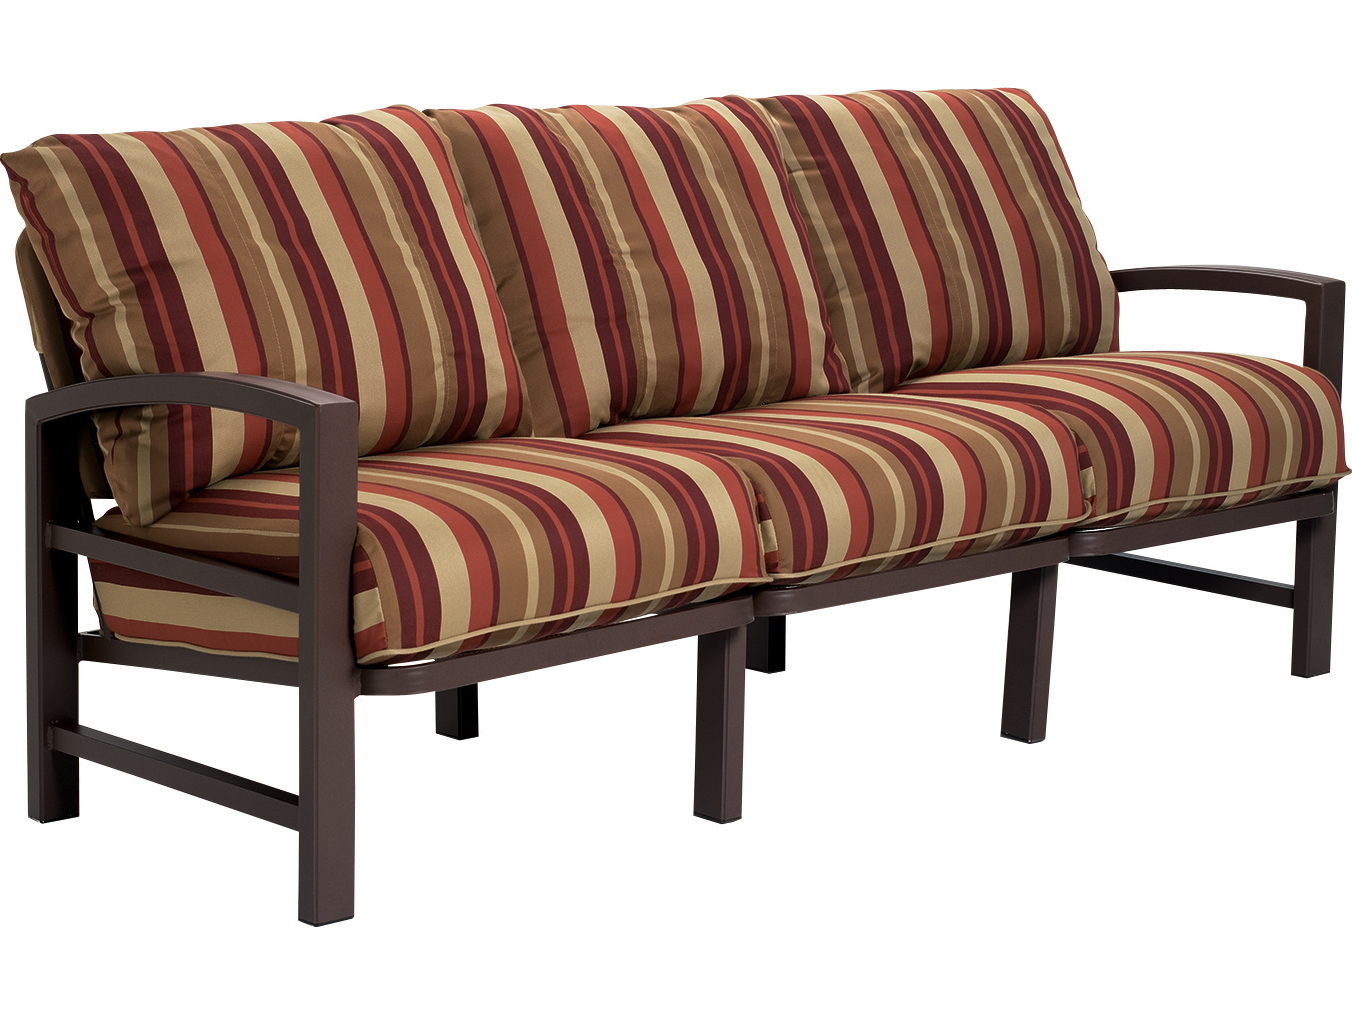 tropitone lakeside cushion sofa replacement cushions. Black Bedroom Furniture Sets. Home Design Ideas